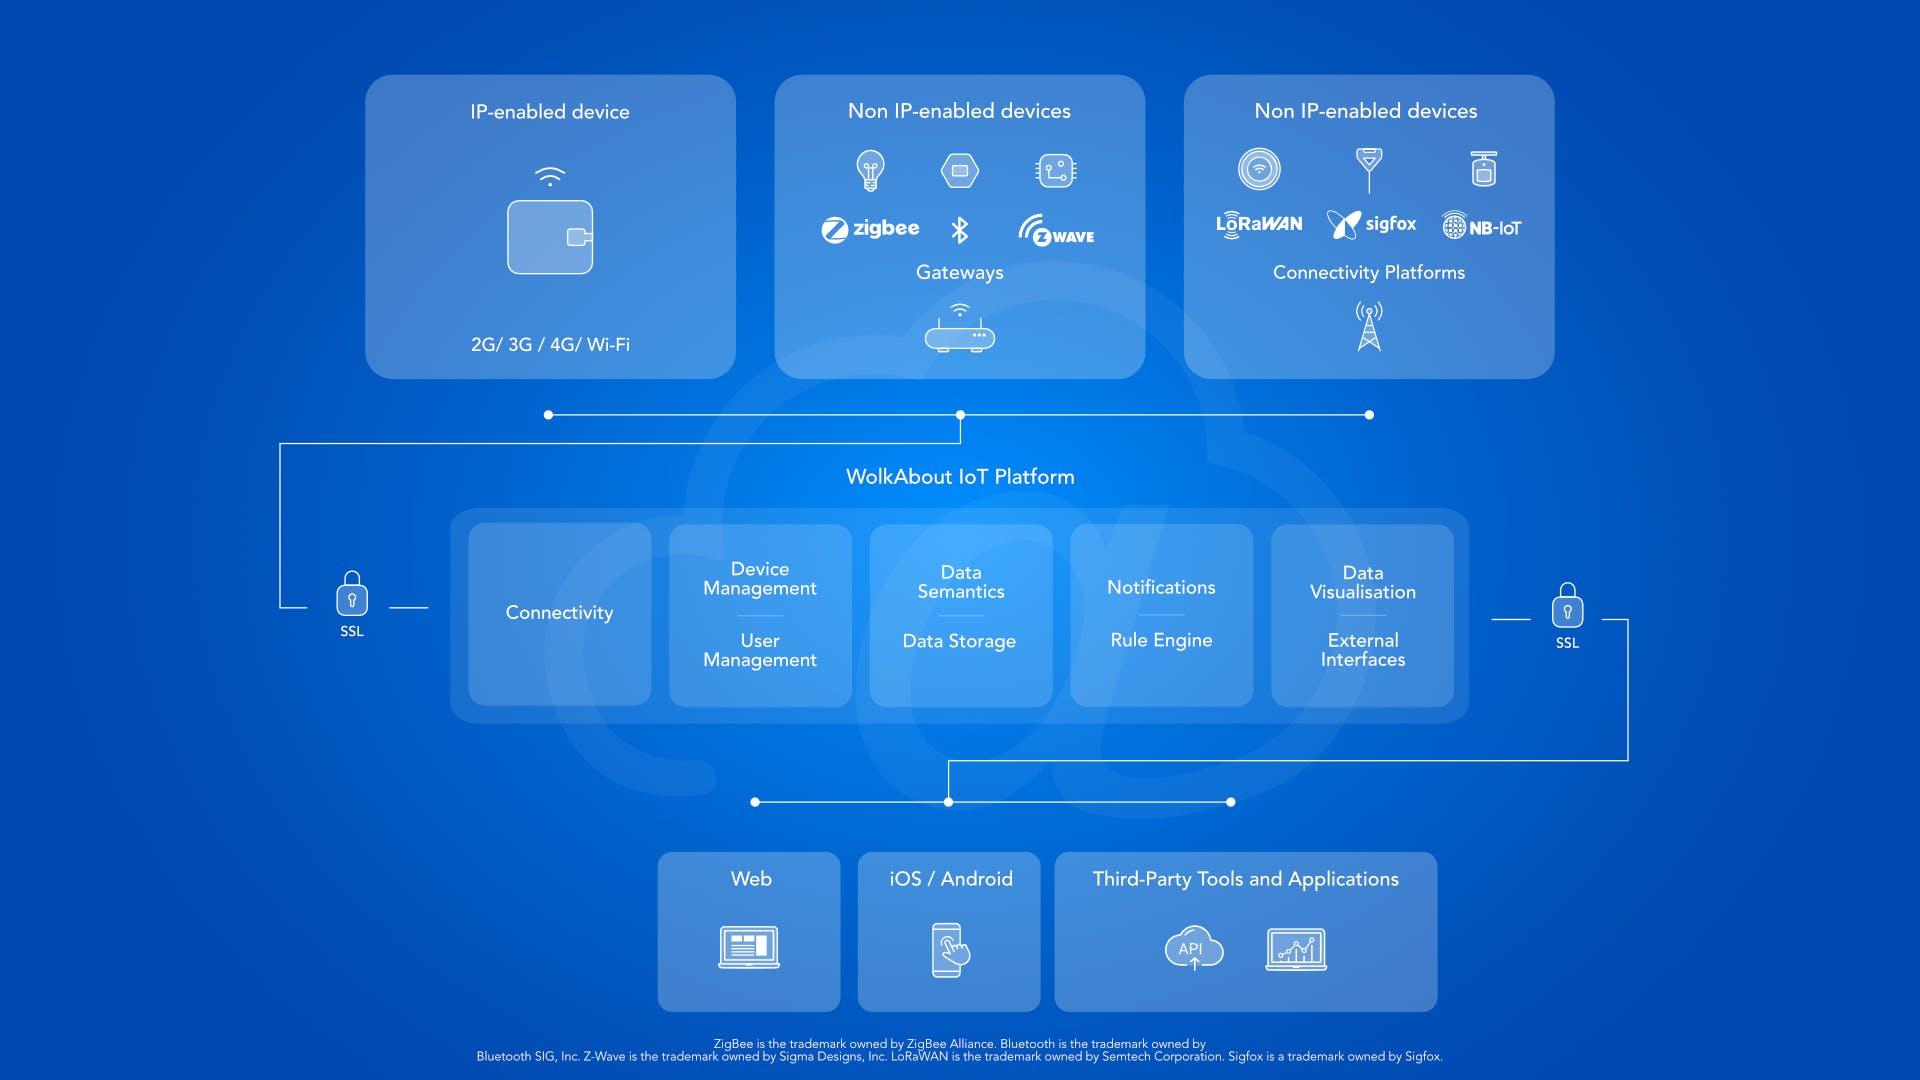 WolkAbout IoT Platform